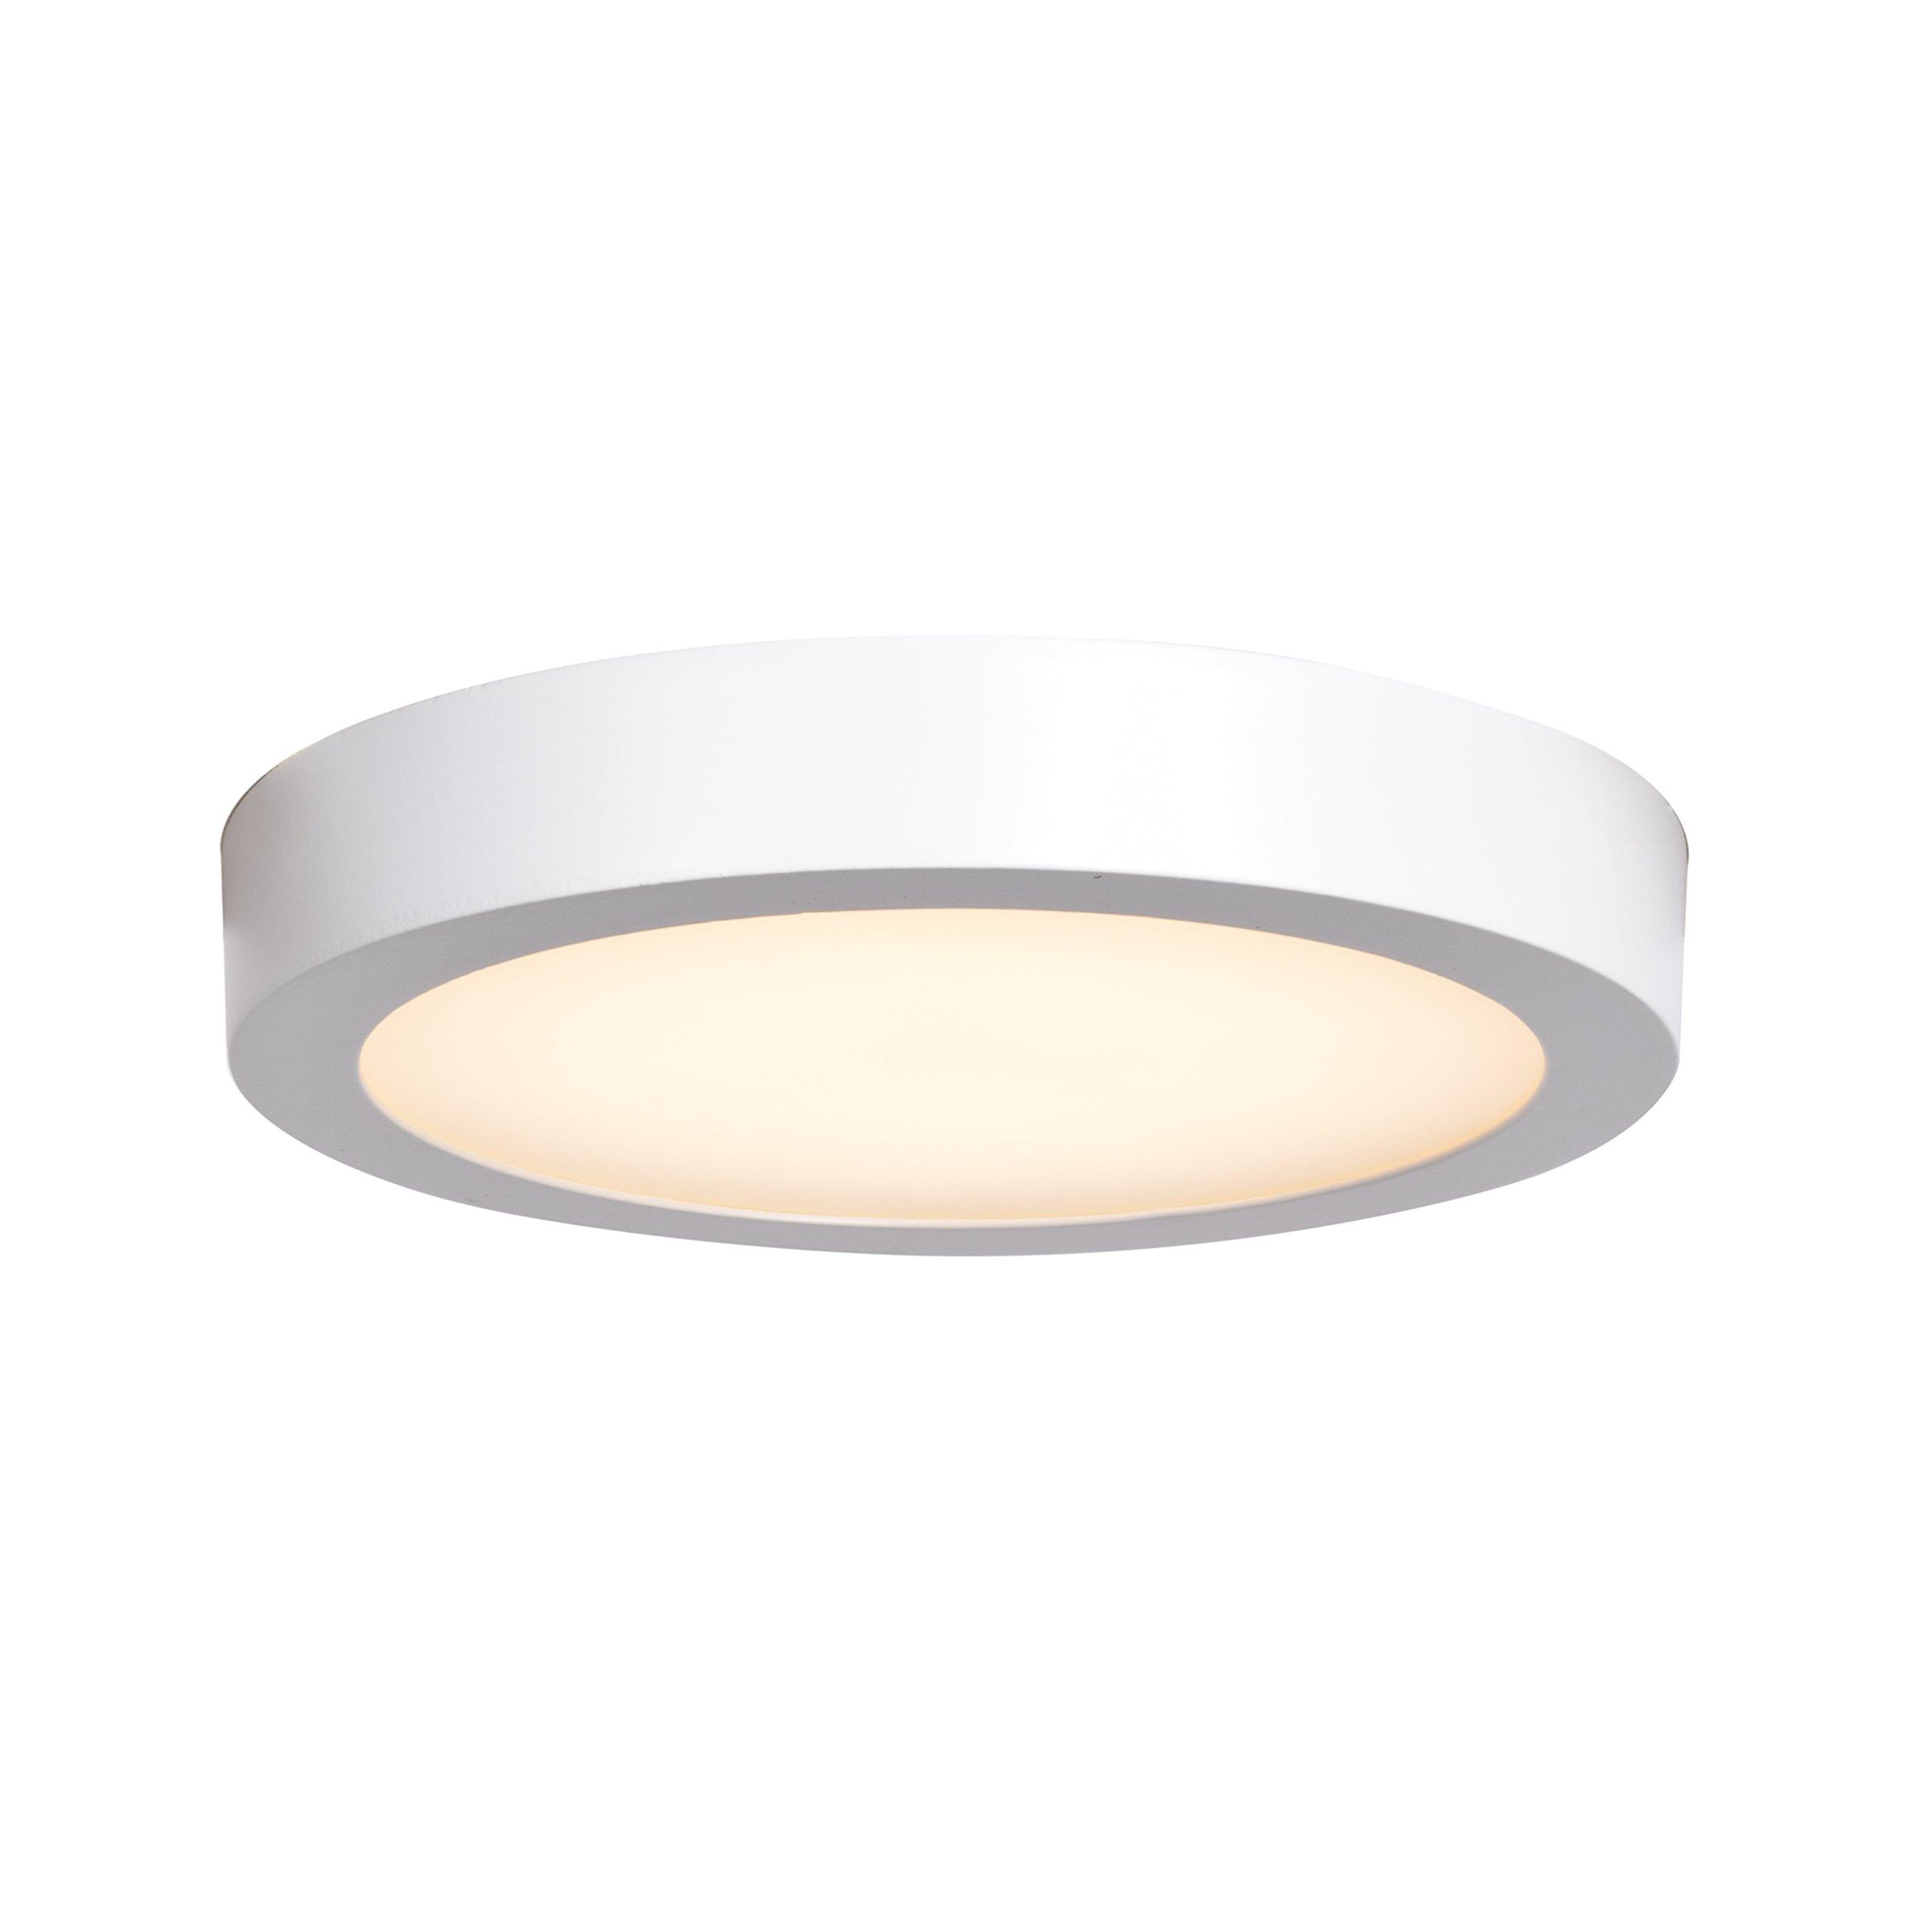 Ulko Exterior LED Outdoor Flush Mount - 9''D - White - Acrylic Lens Diffuser by Access Lighting - HI